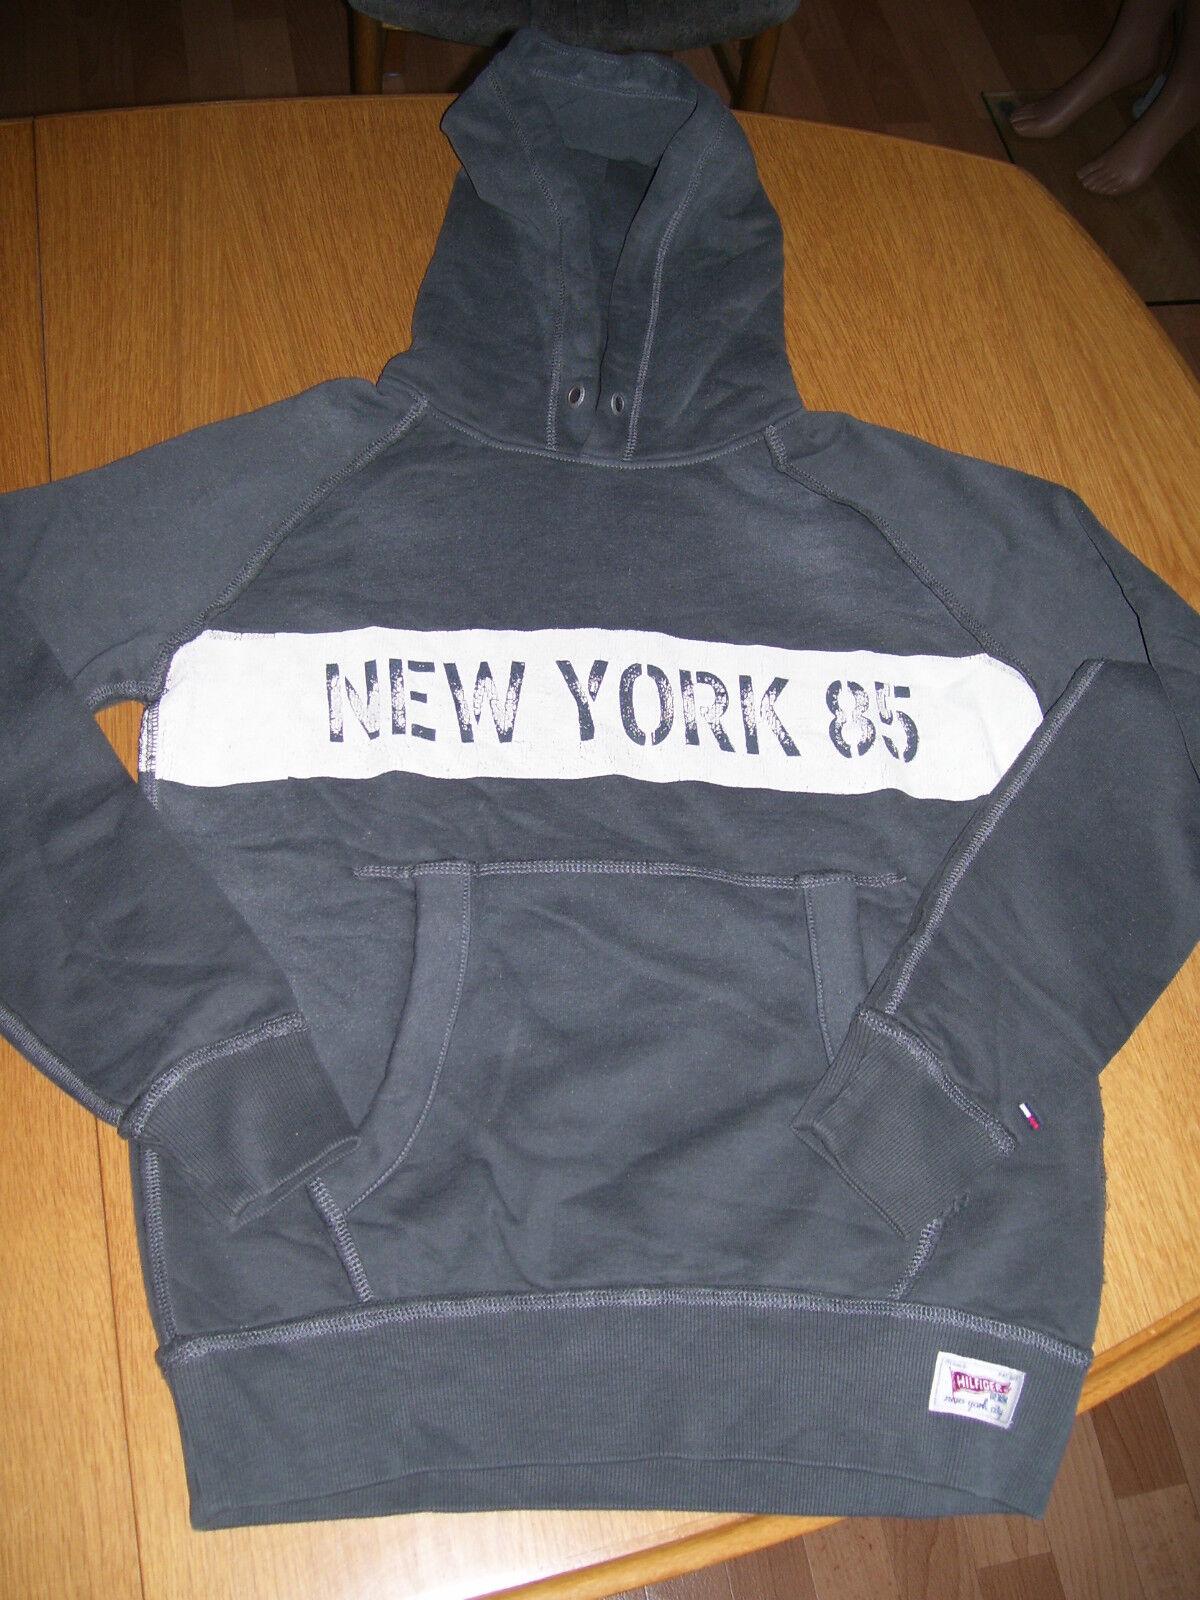 Tommy Hilfiger NEW YORK 85 Hoodie Kaputzenpullover Kaputze Grau S oder M neu